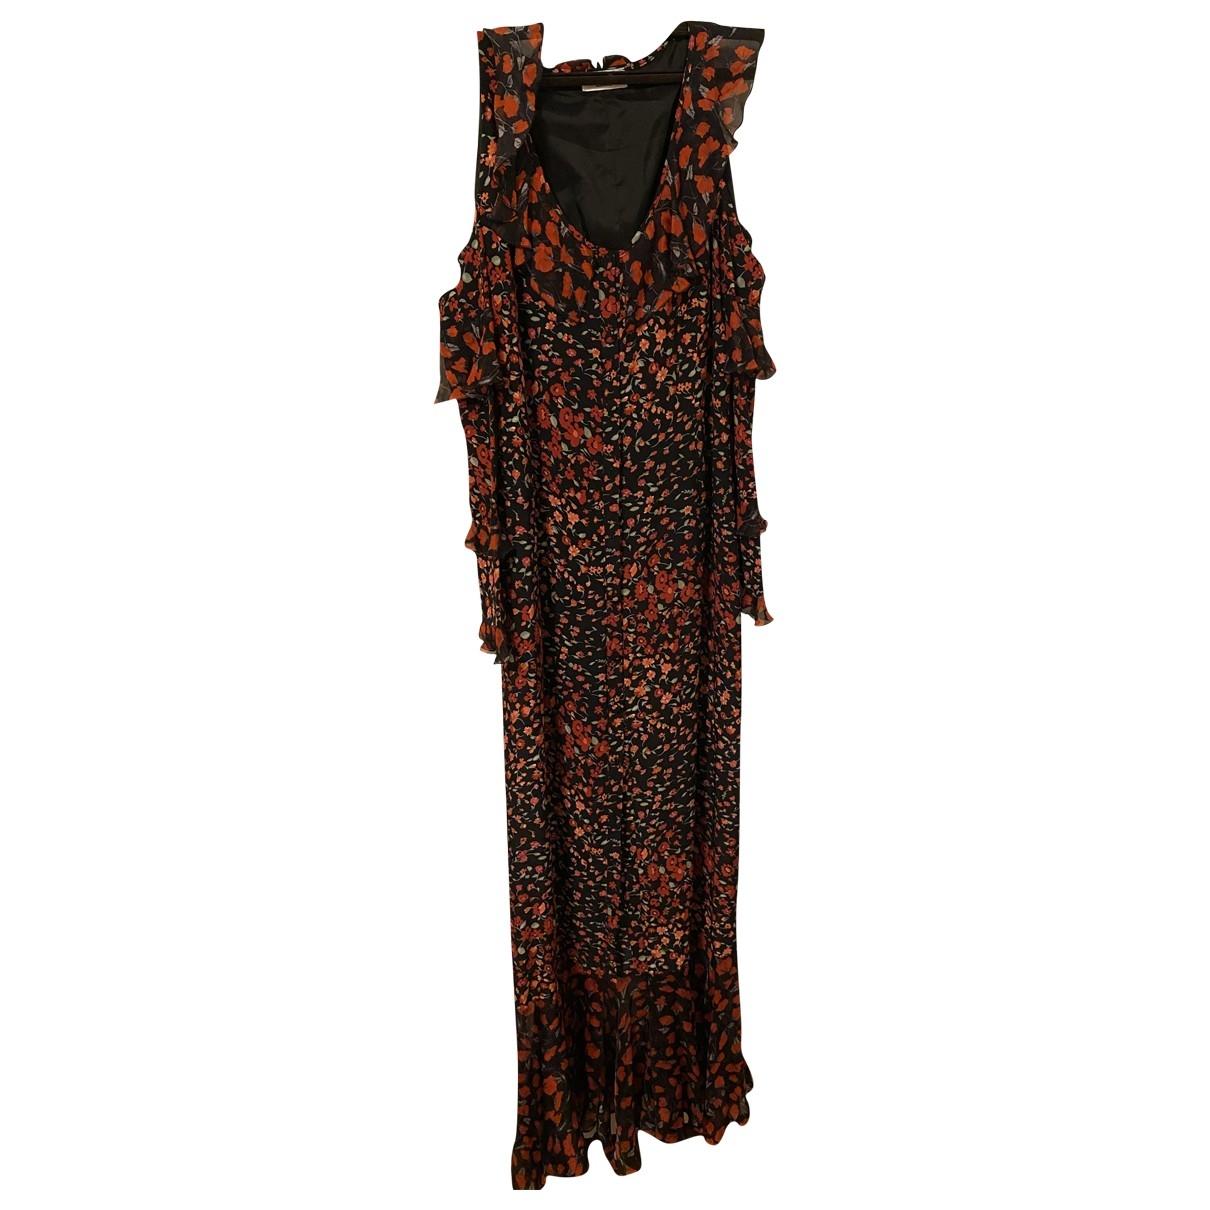 Raquel Diniz \N Red dress for Women 40 IT